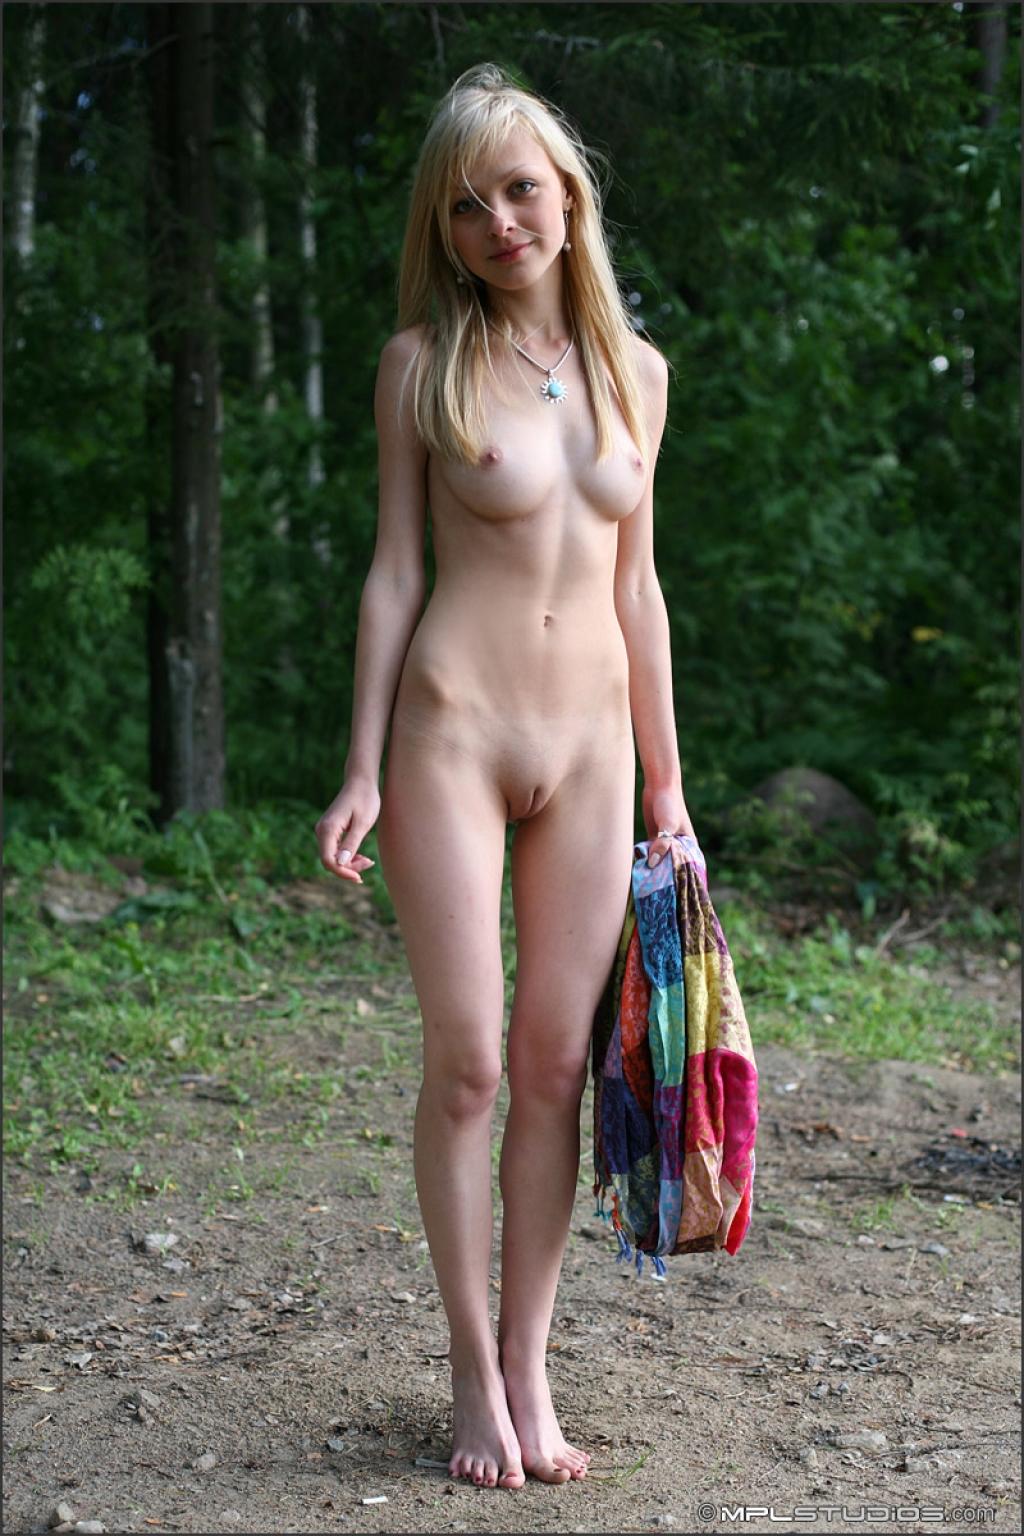 ru nudist!8